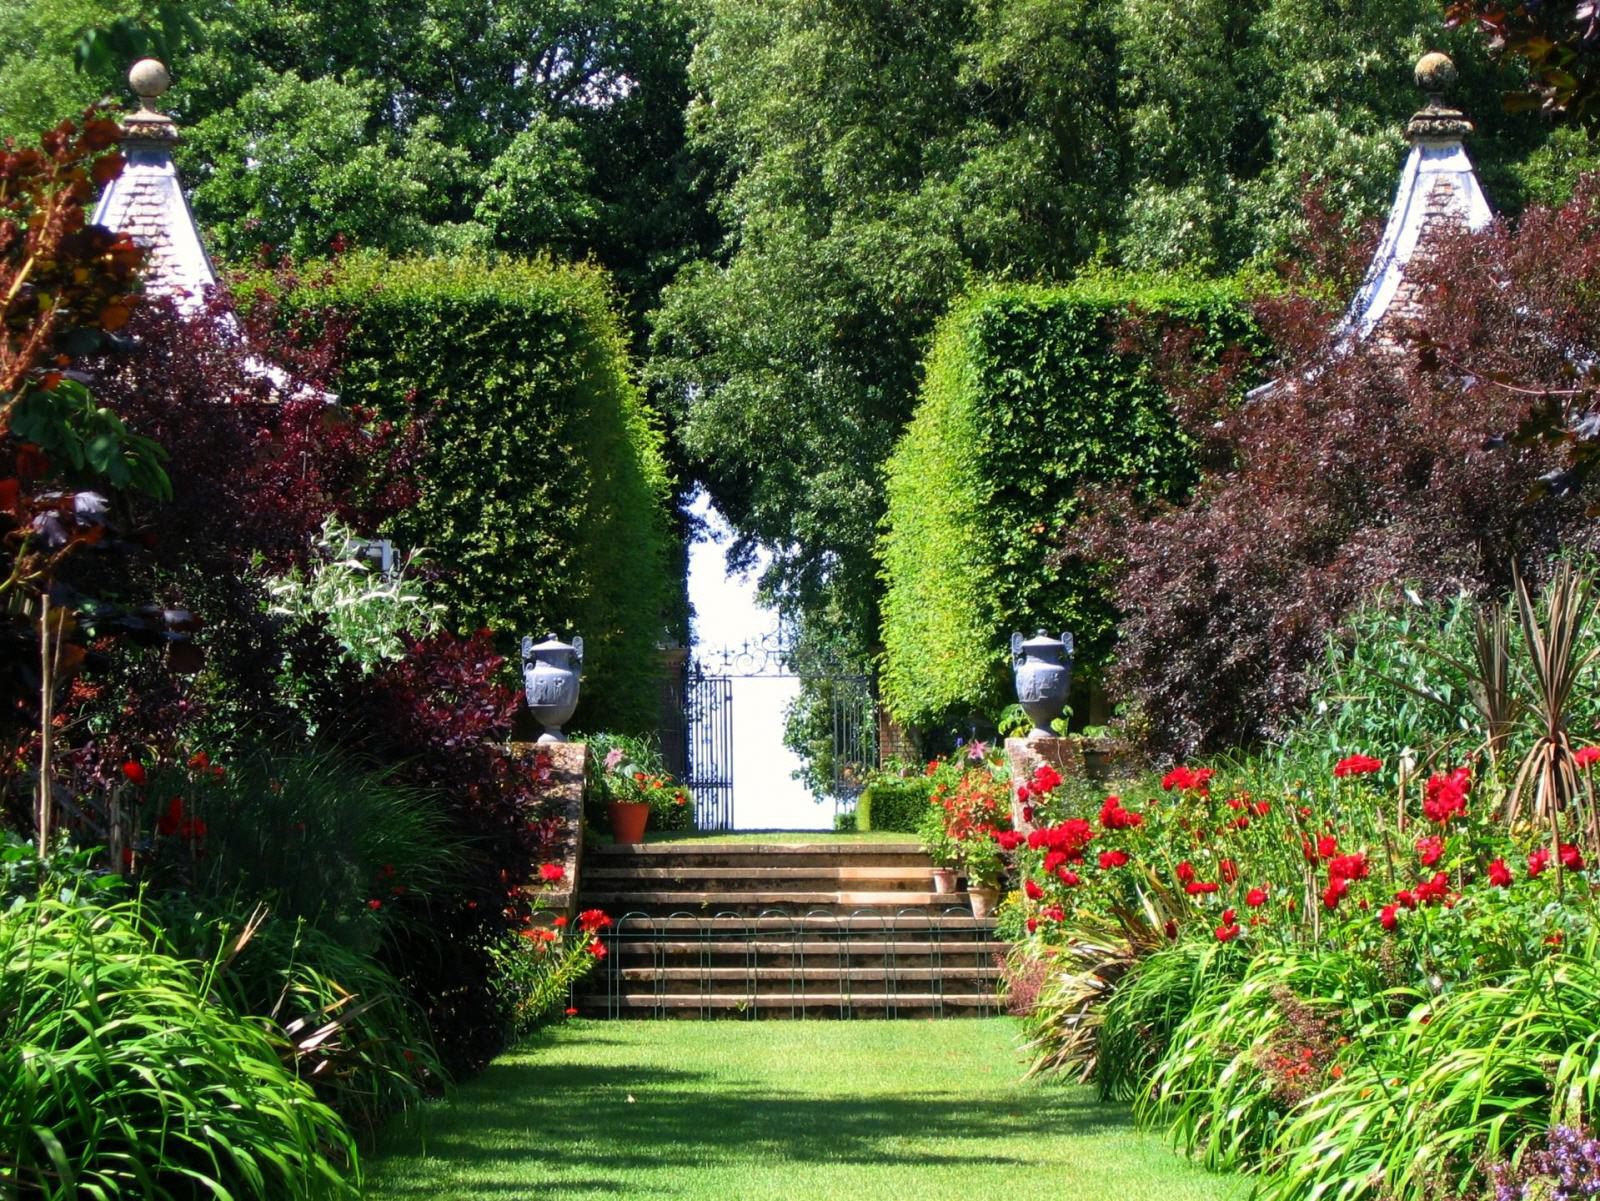 http://2.bp.blogspot.com/-fjmgJkkEdxM/UDifw95BIwI/AAAAAAAABvI/pMMkezbf3Fs/s1600/Beautiful+Japanese+Garden+%252812%2529.jpg